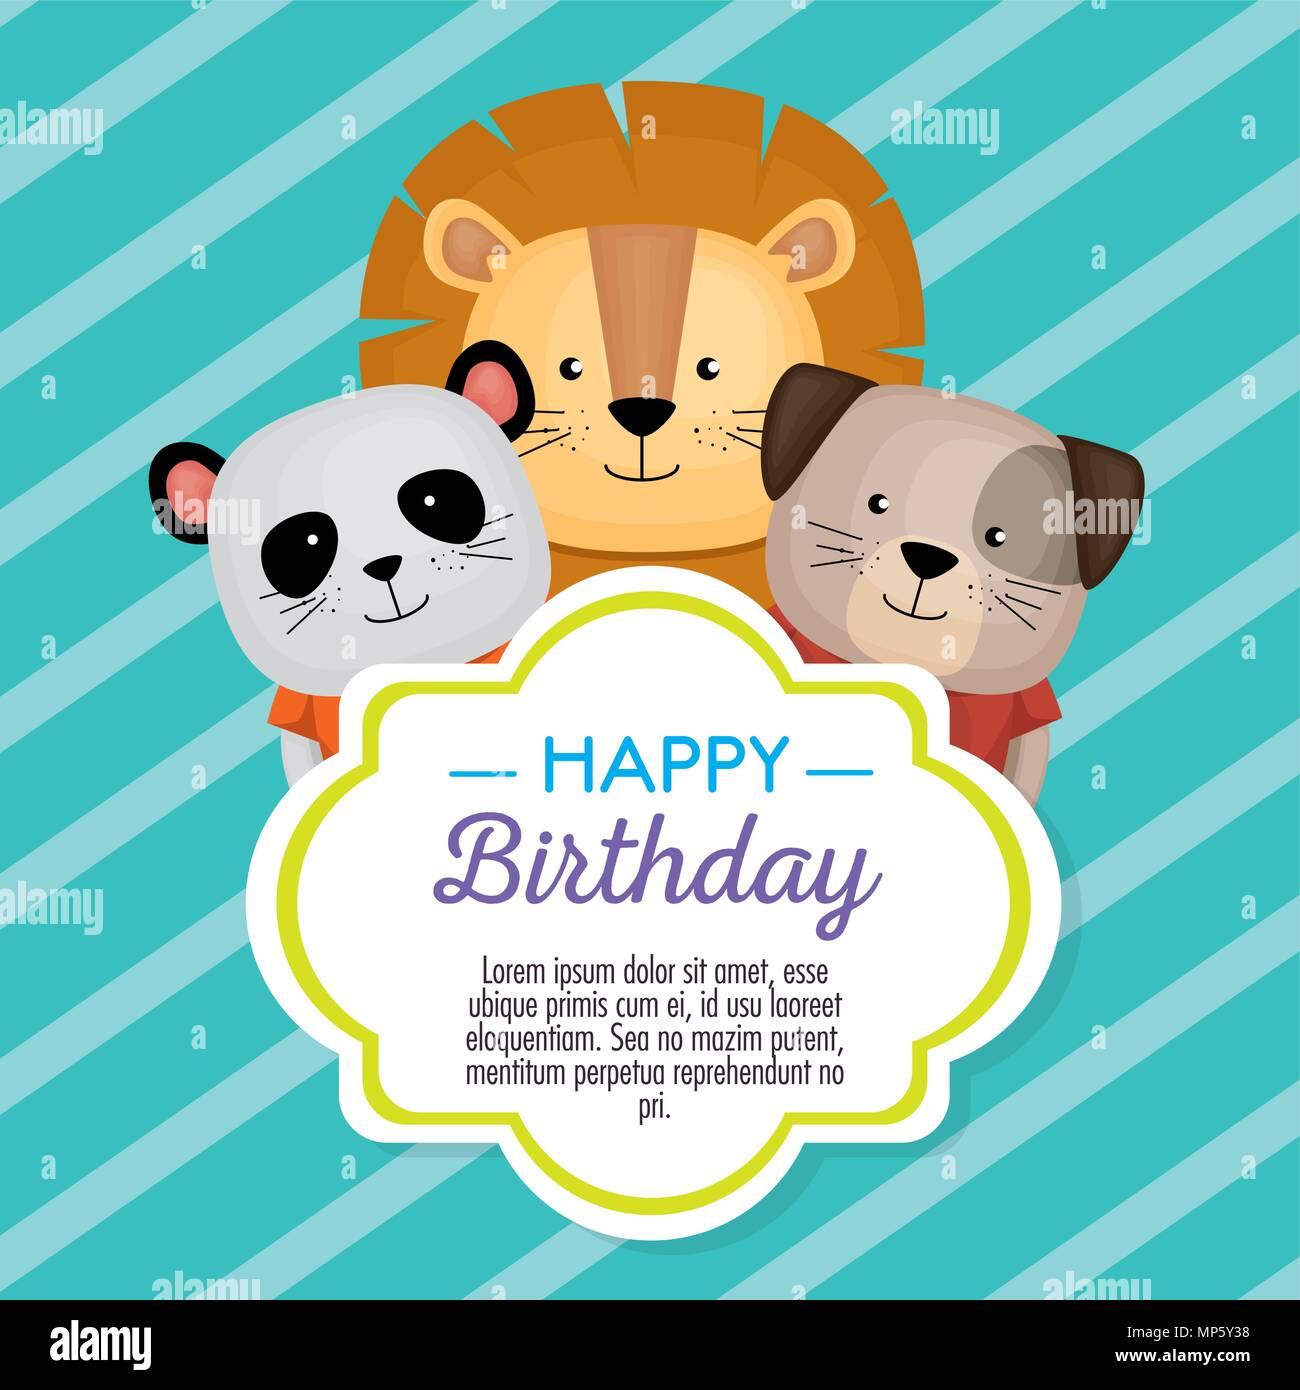 Happy Birthday Card With Cute Animals Stock Vector Art